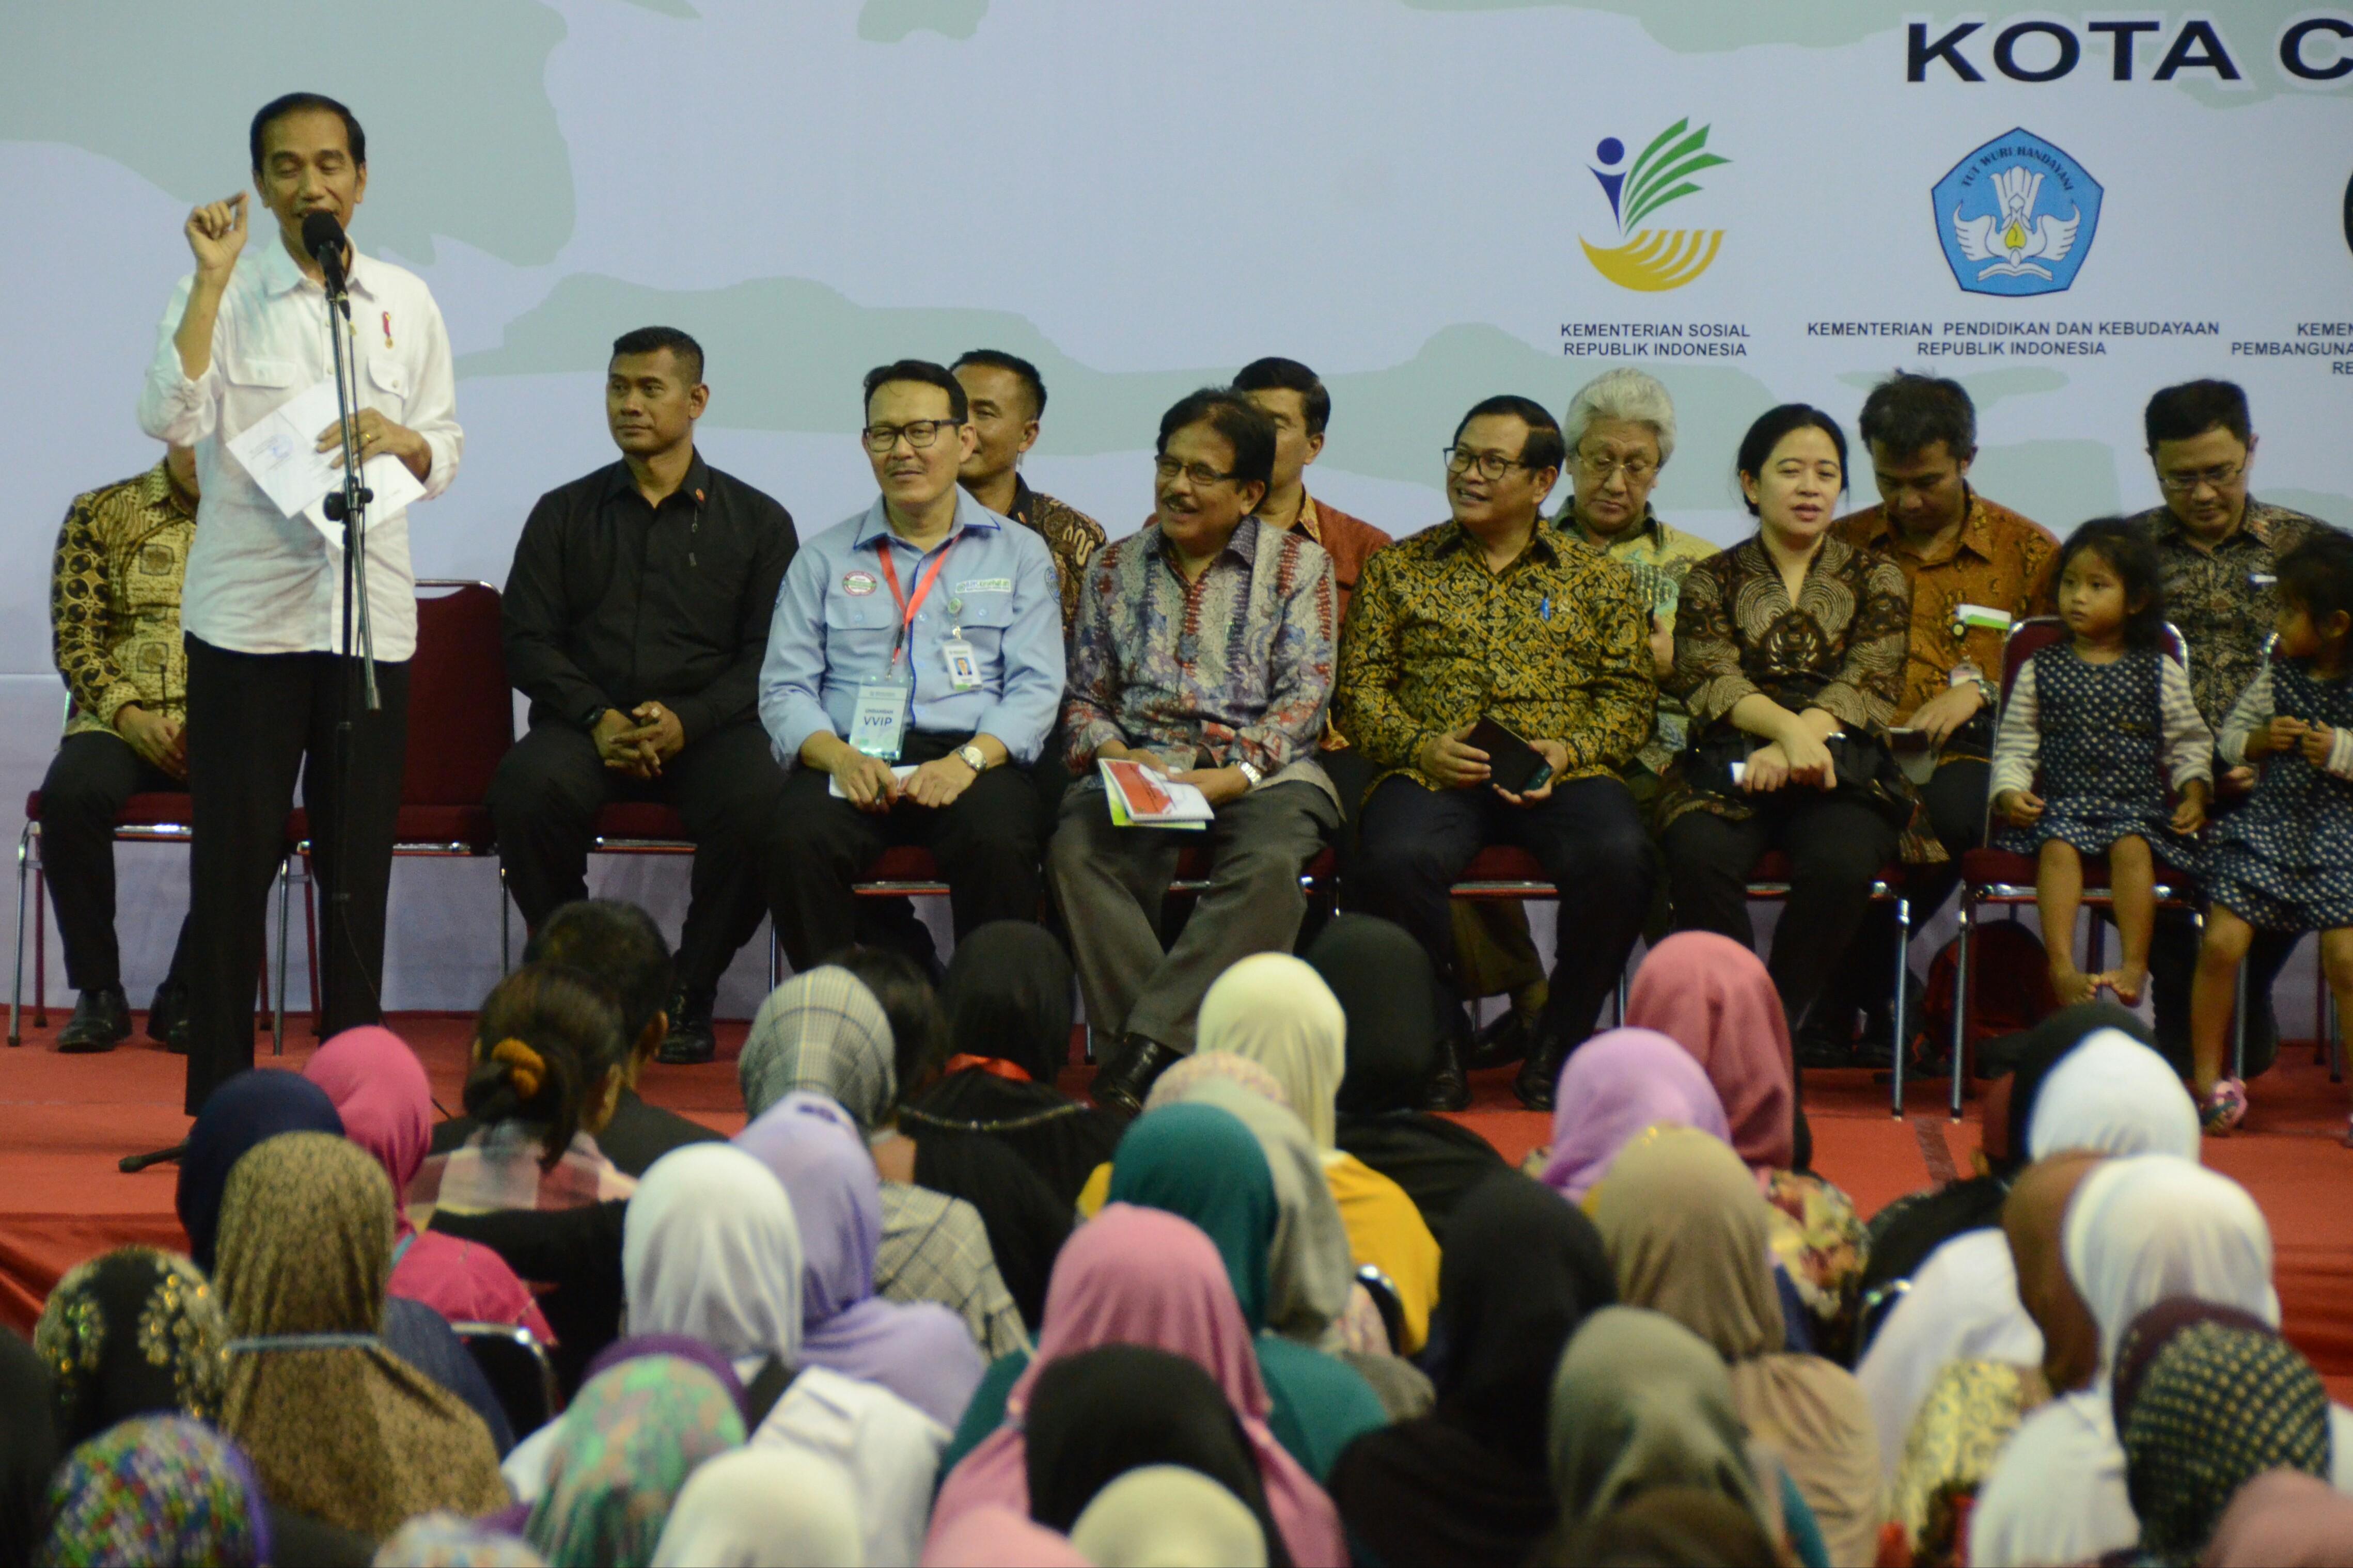 Presiden Jokowi saat memberikan KIS, KIP, PMT, dan PKH di Gedung Olahraga (GOR) Bima, Kota Cirebon, Jawa Barat, Kamis (13/4). (Foto: Humas/Rahmat)